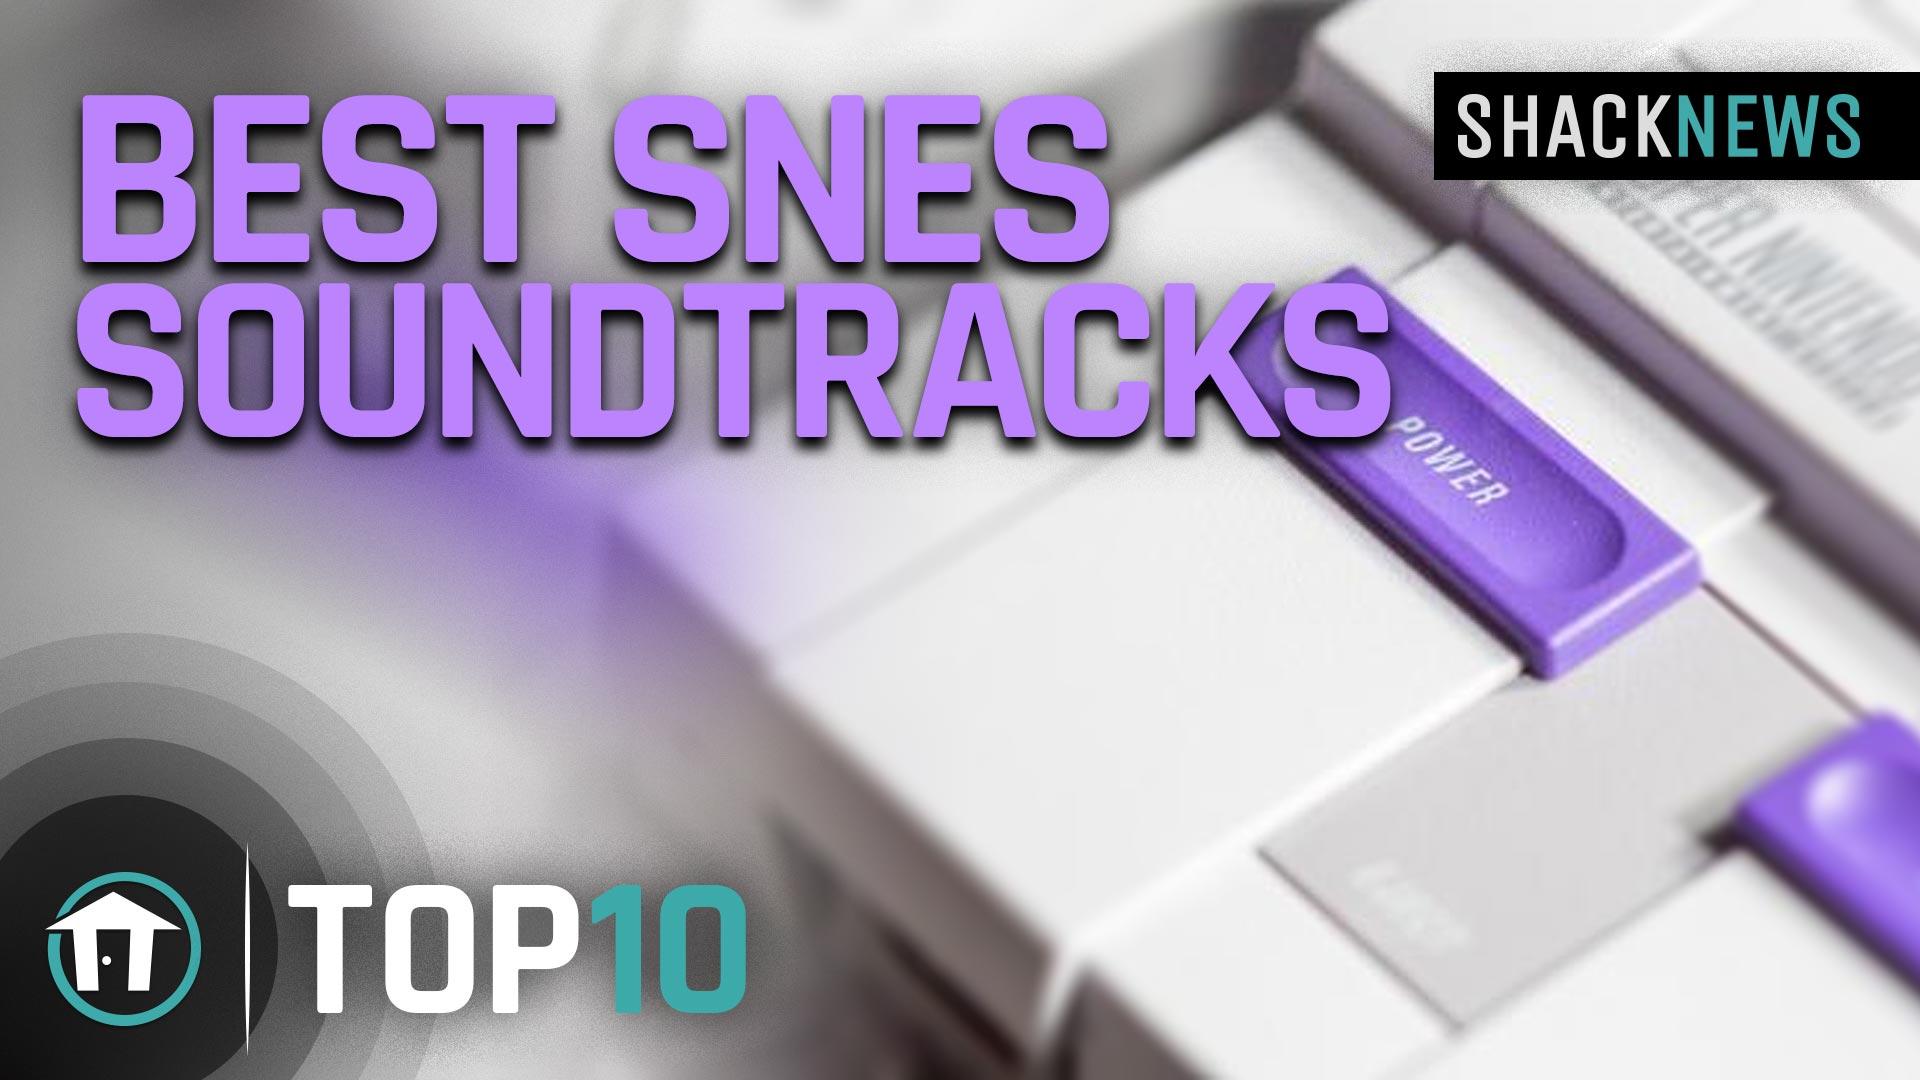 Top 10 SNES video game soundtracks | Shacknews